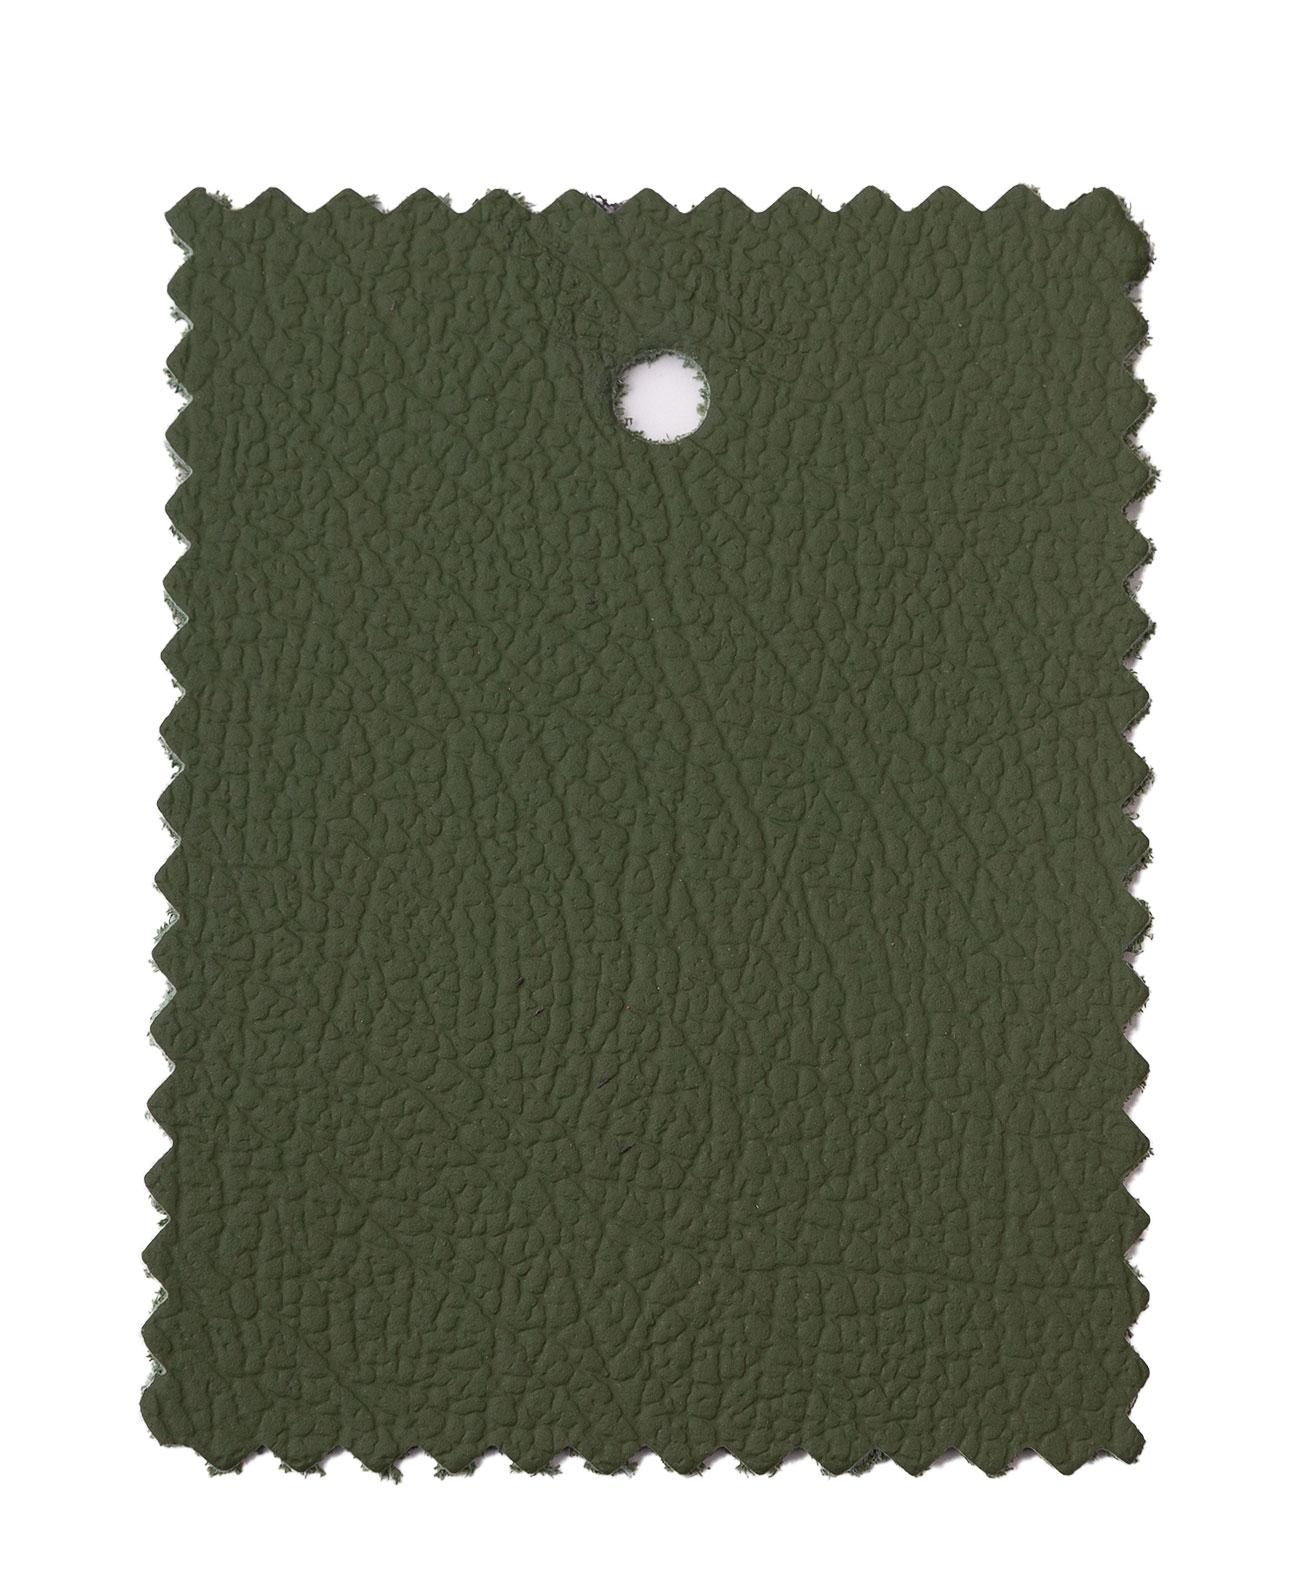 Abbildung mb-old-1078-resedagrün